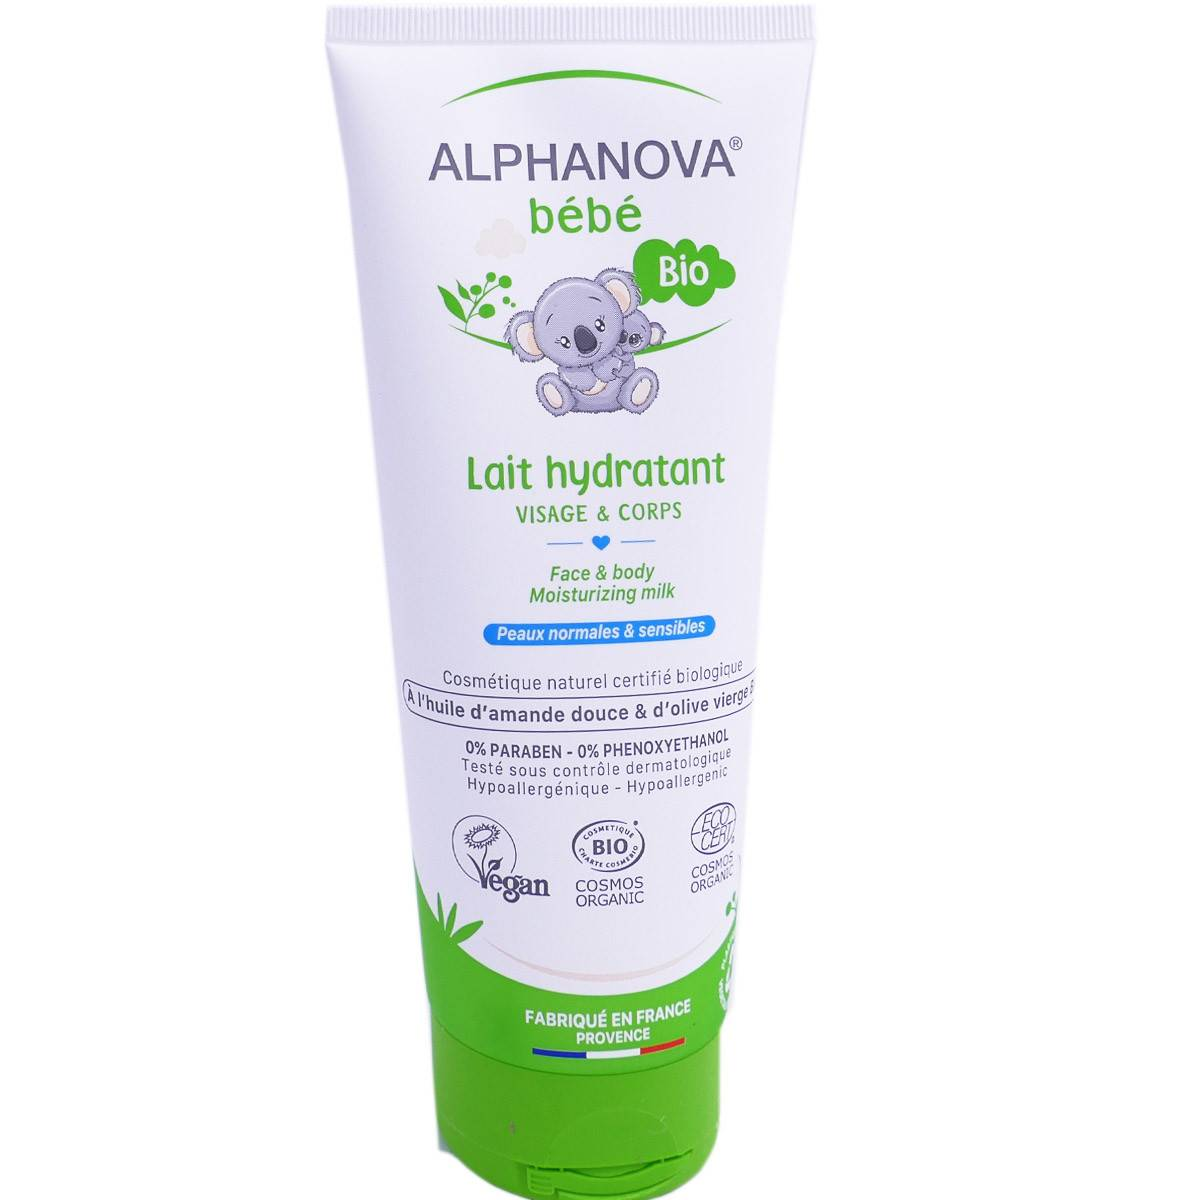 Alphanova bebe lait hydratant bio visage & corps 200ml